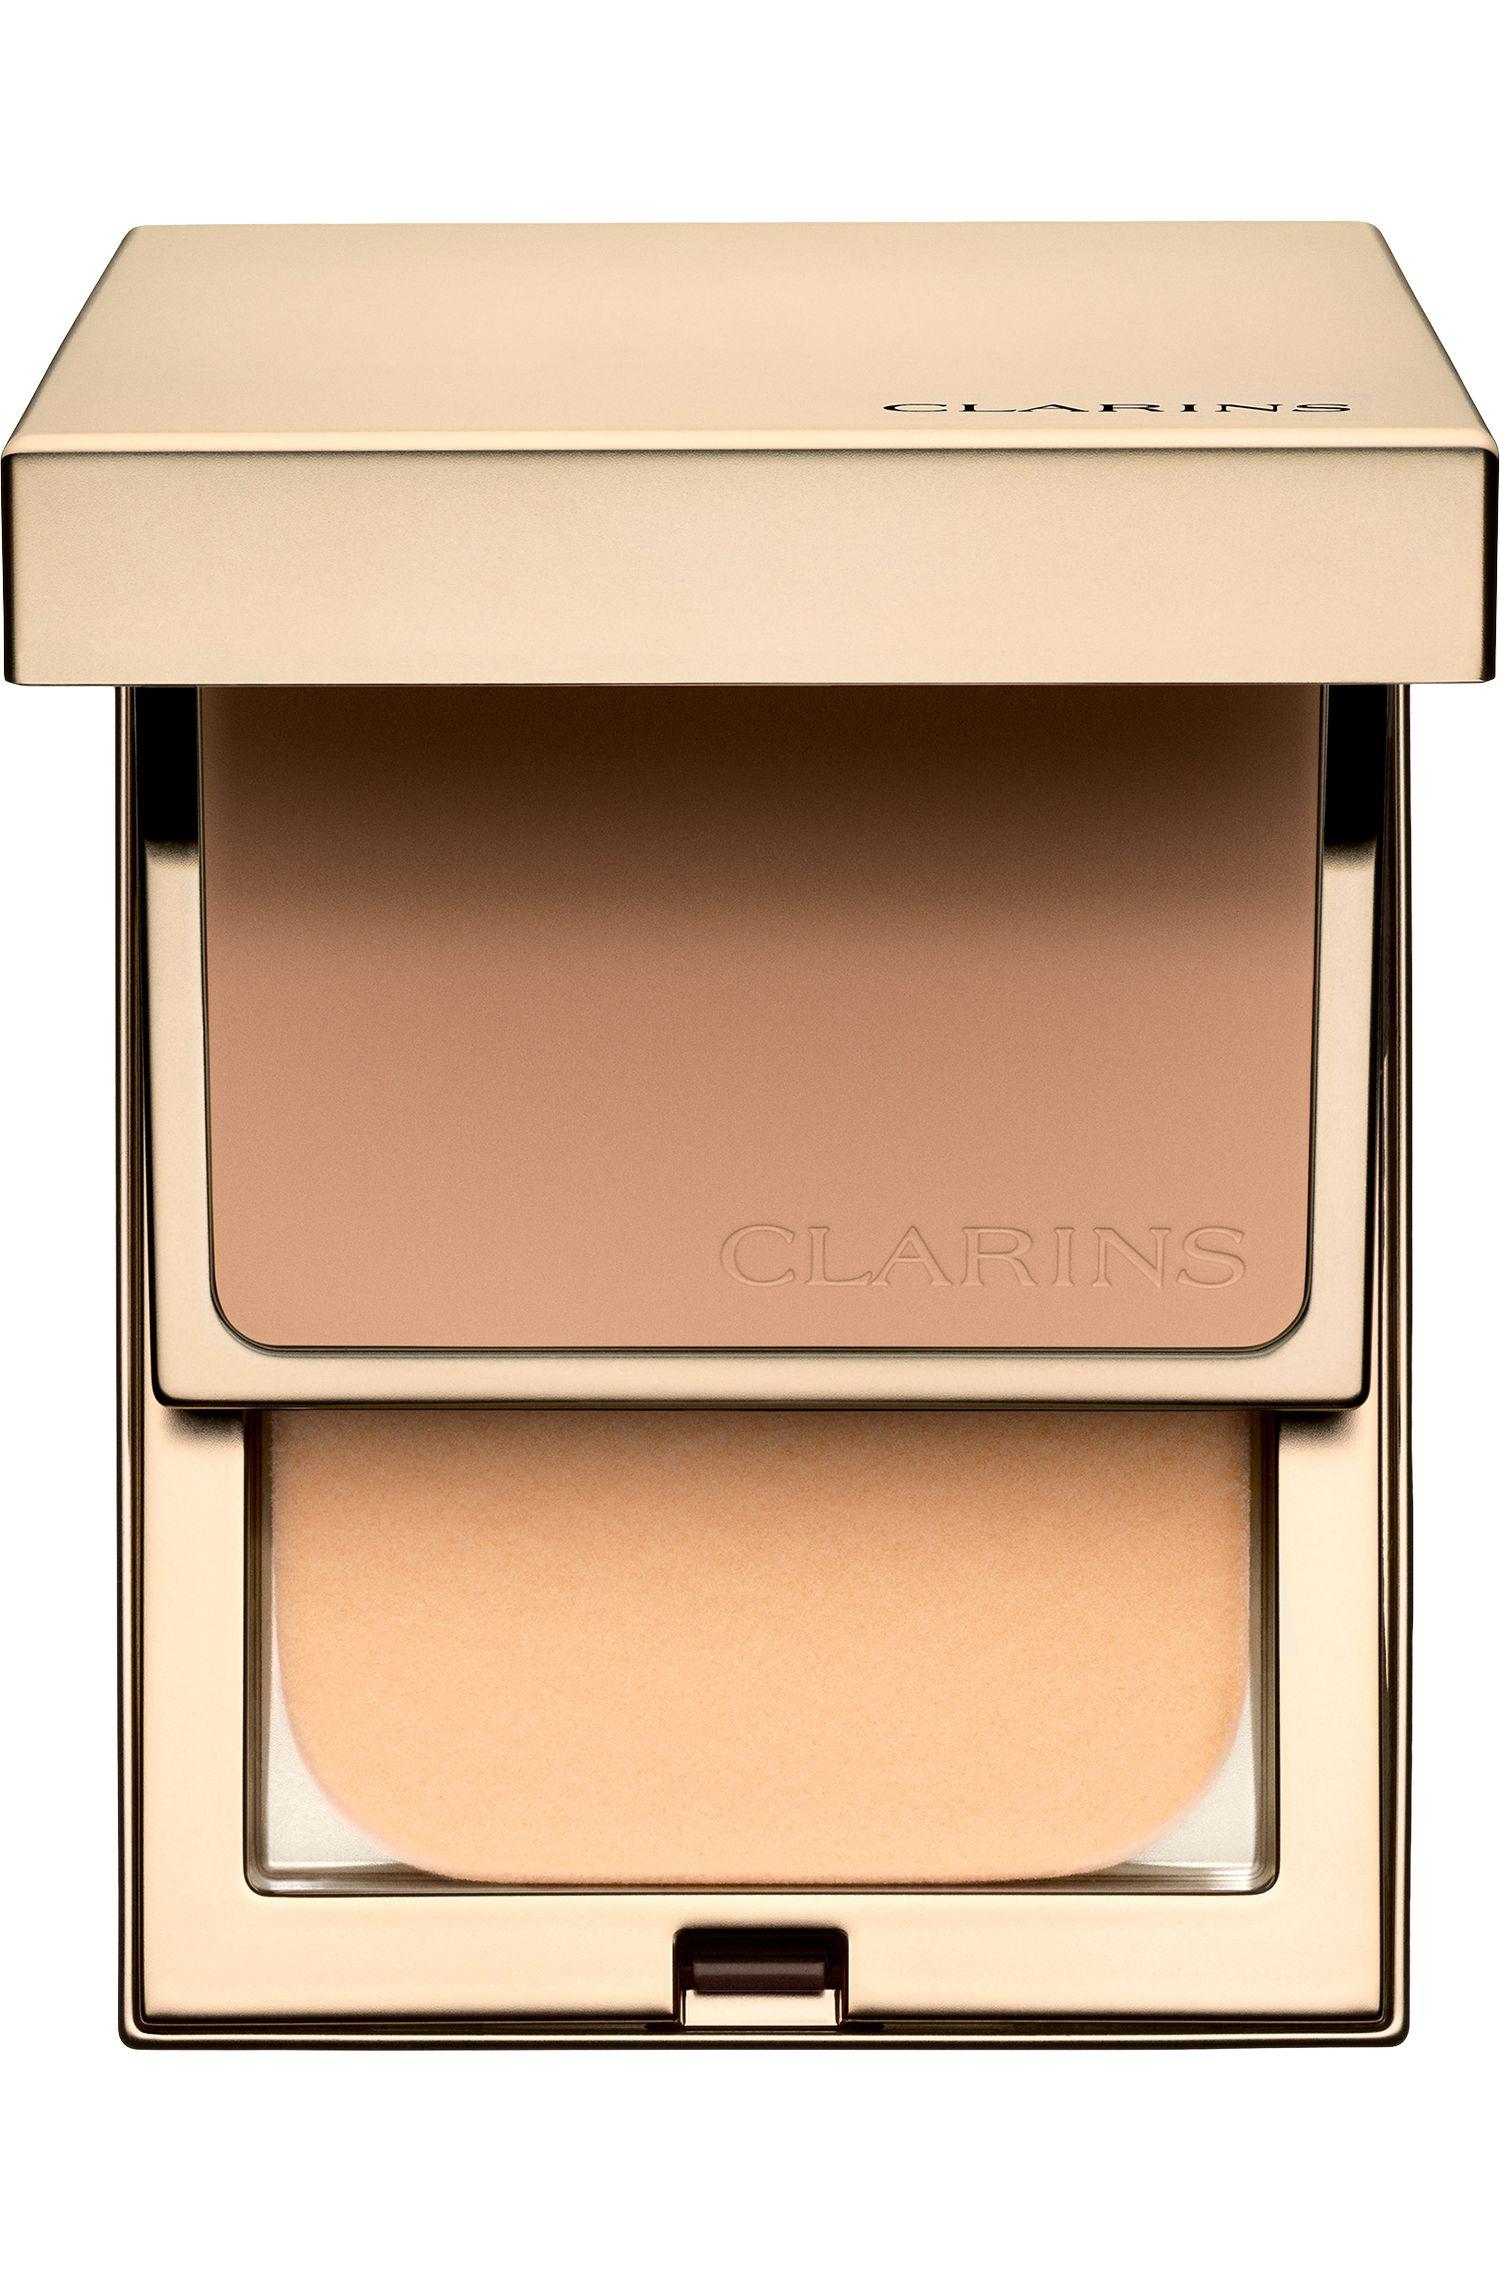 Blissim : Clarins - Fond de teint compact haute tenue anti-pollution Everlasting SPF 9 - 112 Amber